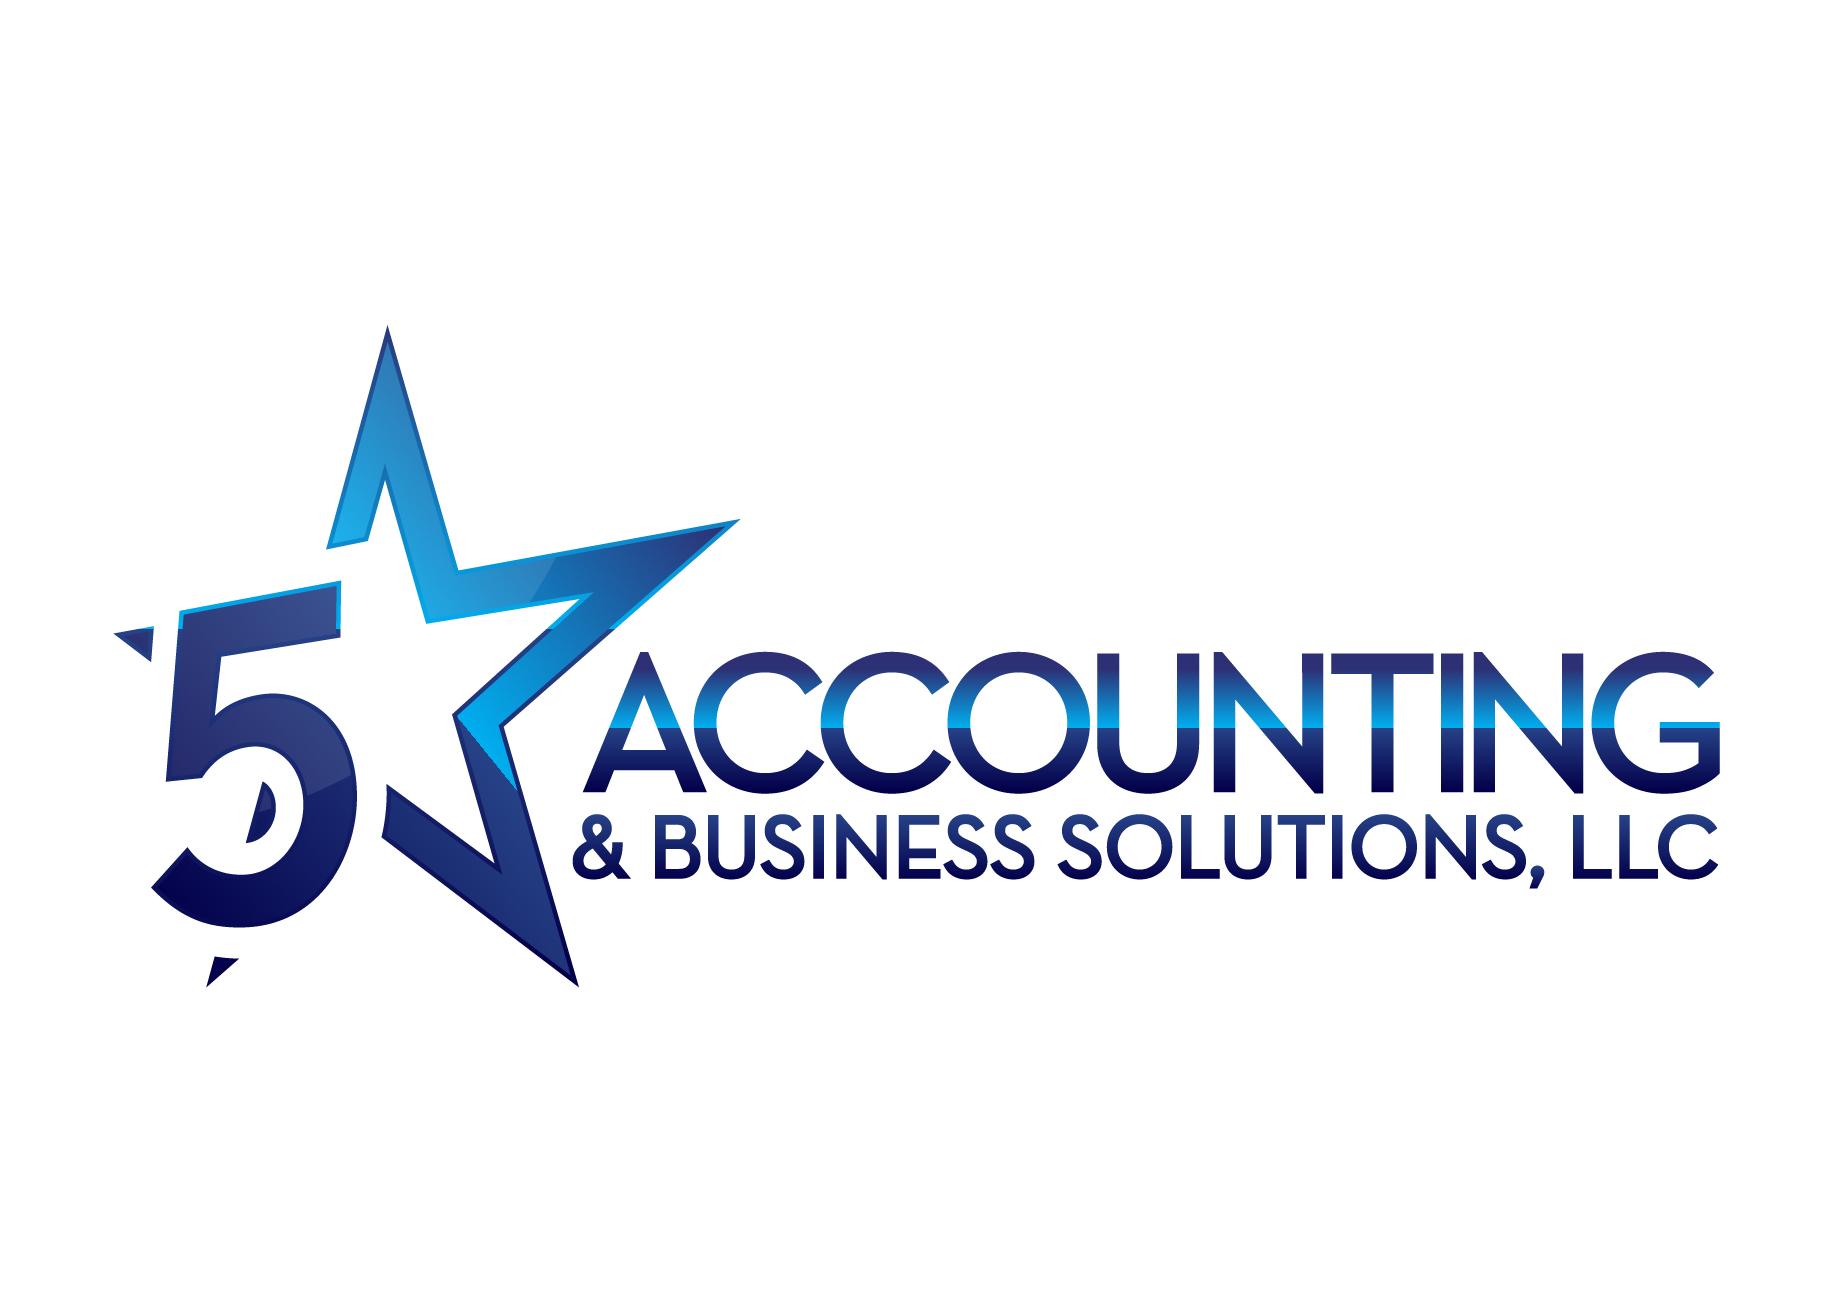 5-Star-Accounting-&-Business-Solutions-LLC-logo-Final-6498.jpg